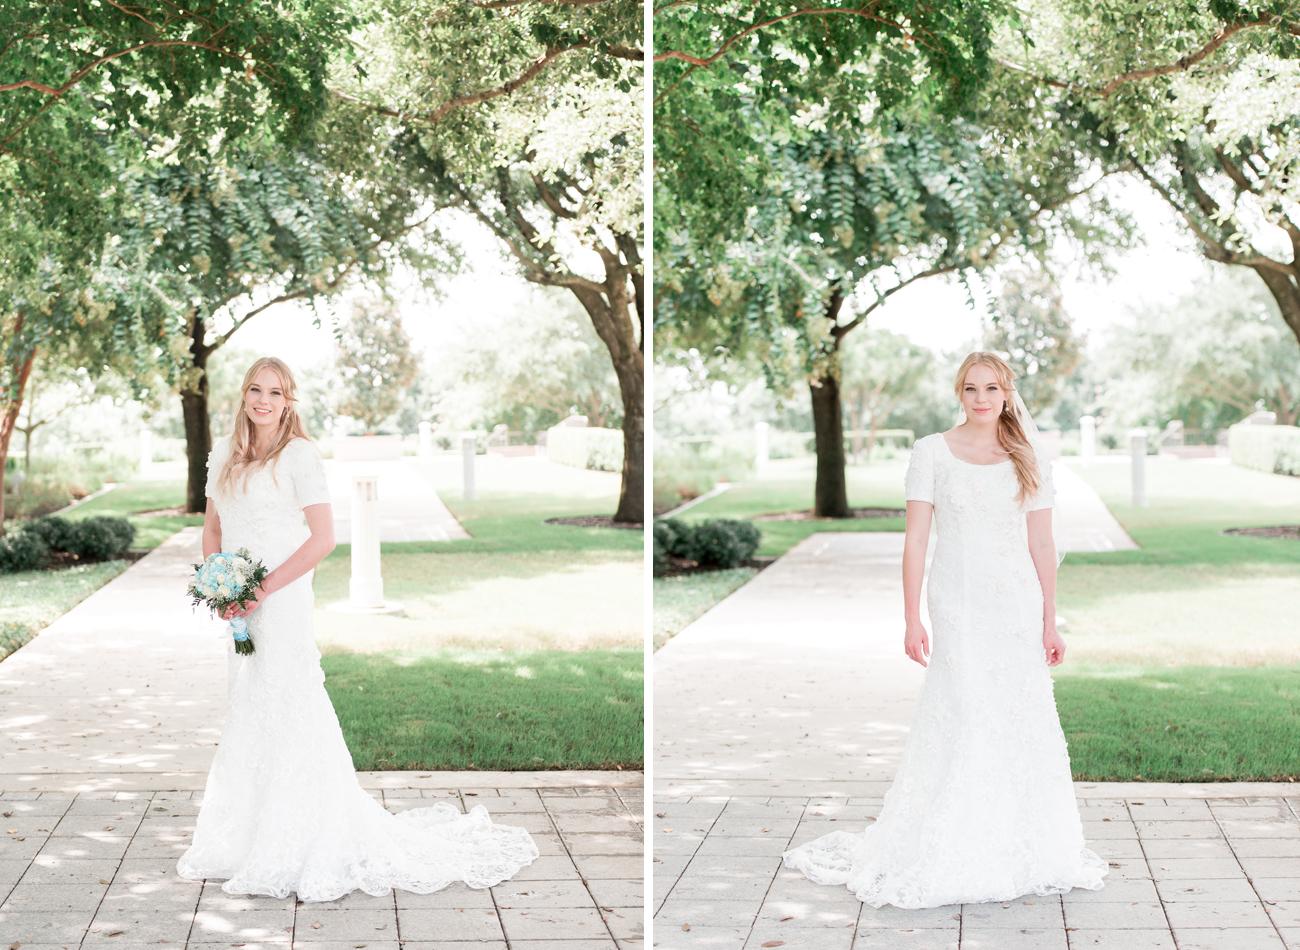 Rebekah and Brian | San Antonio LDS Wedding Photographer-10.5